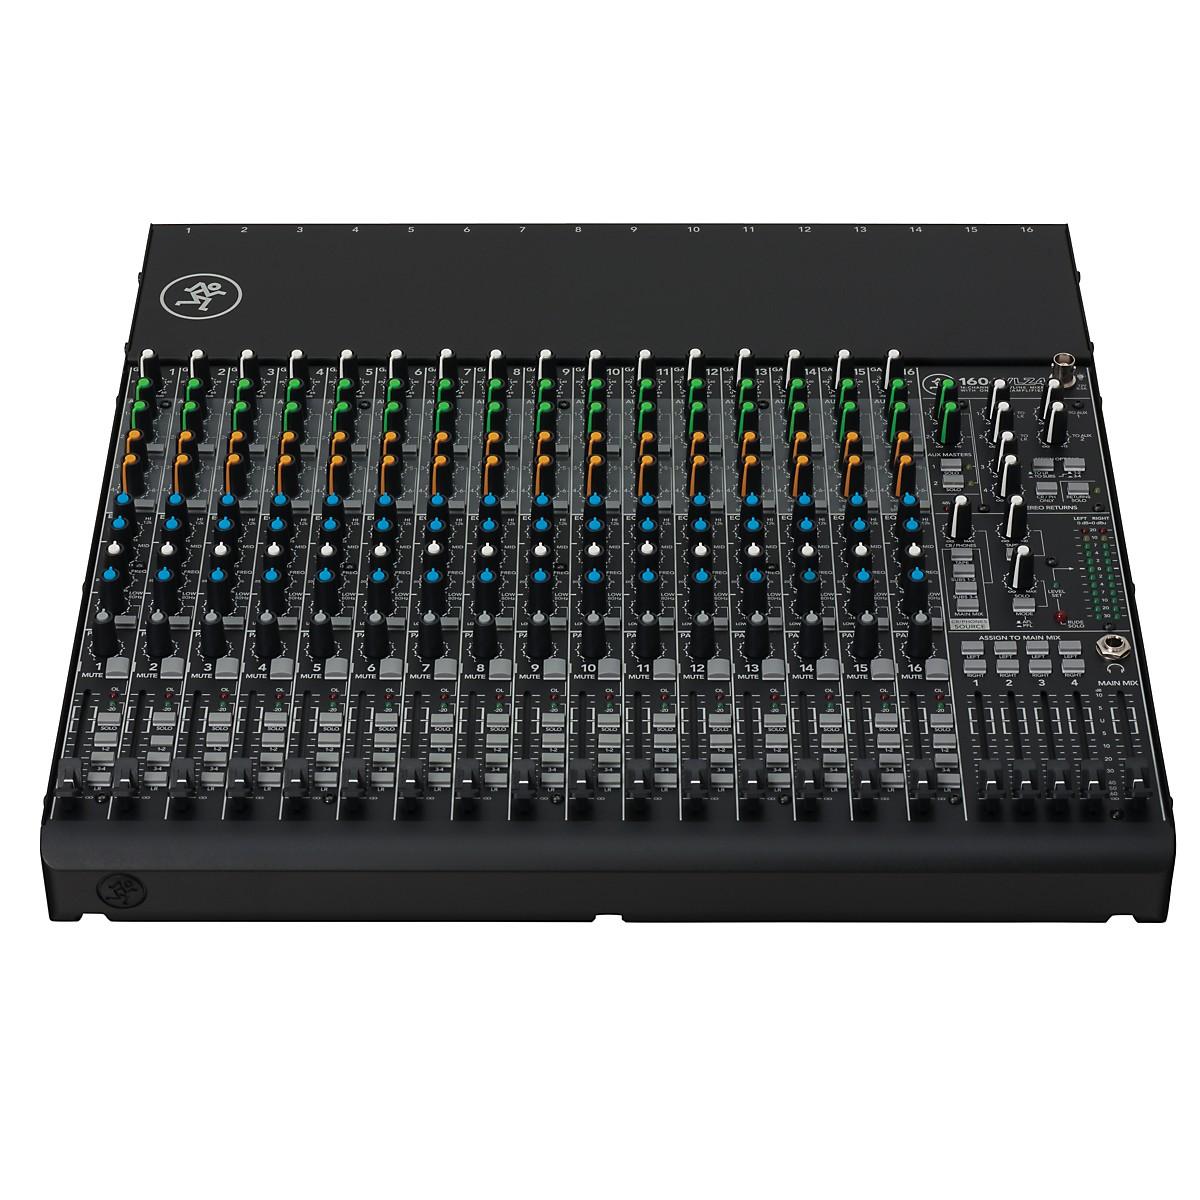 Mackie VLZ4 Series 1604VLZ4 16-Channel/4-Bus Compact Mixer